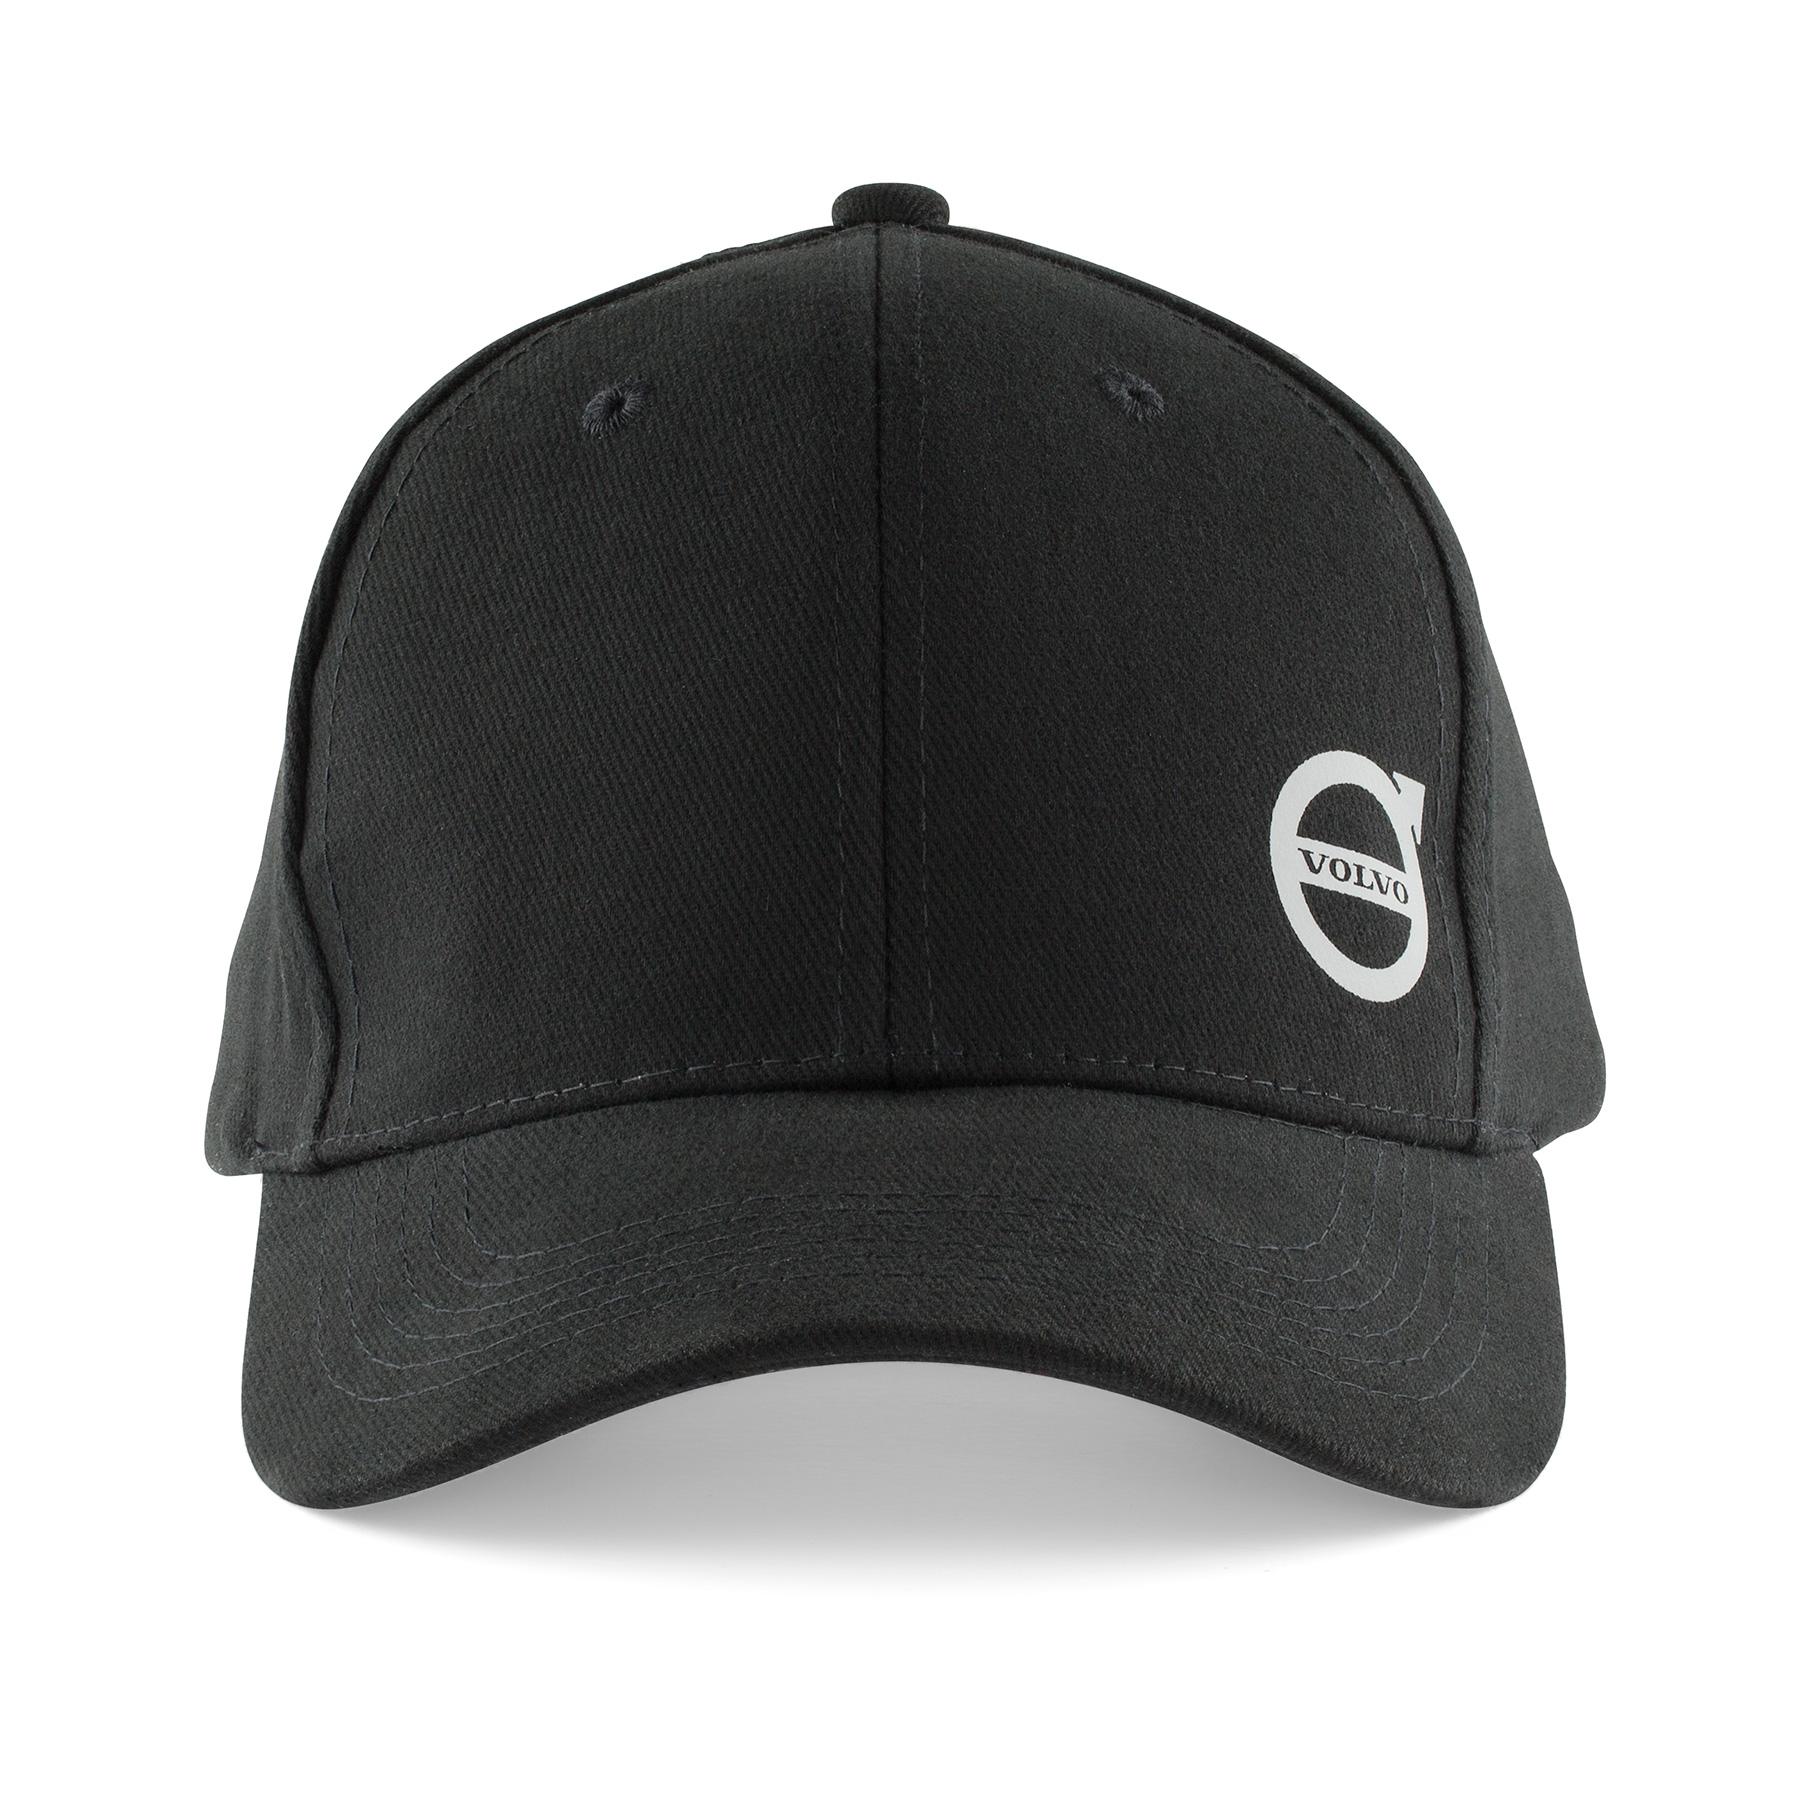 Volvo Car Lifestyle Collection Shop Black Cap